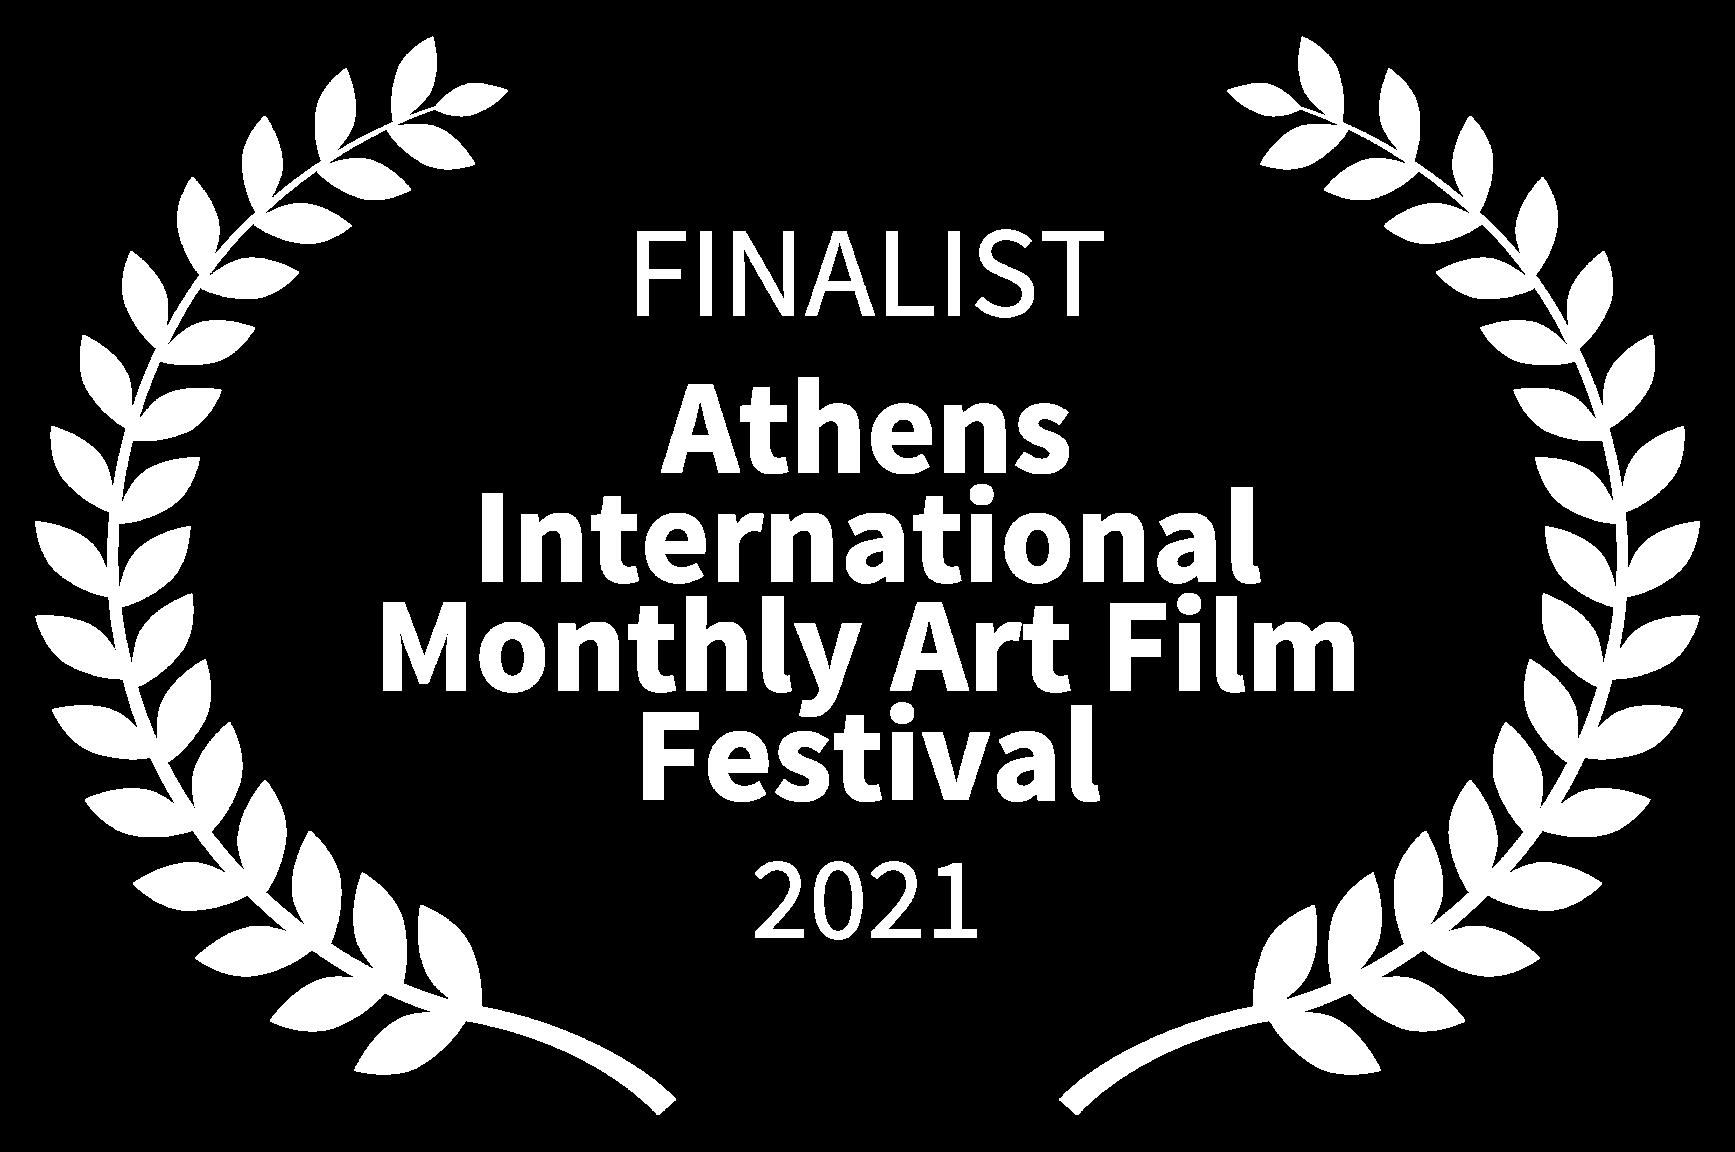 FINALIST - Athens International Monthly Art Film Festival - 2021